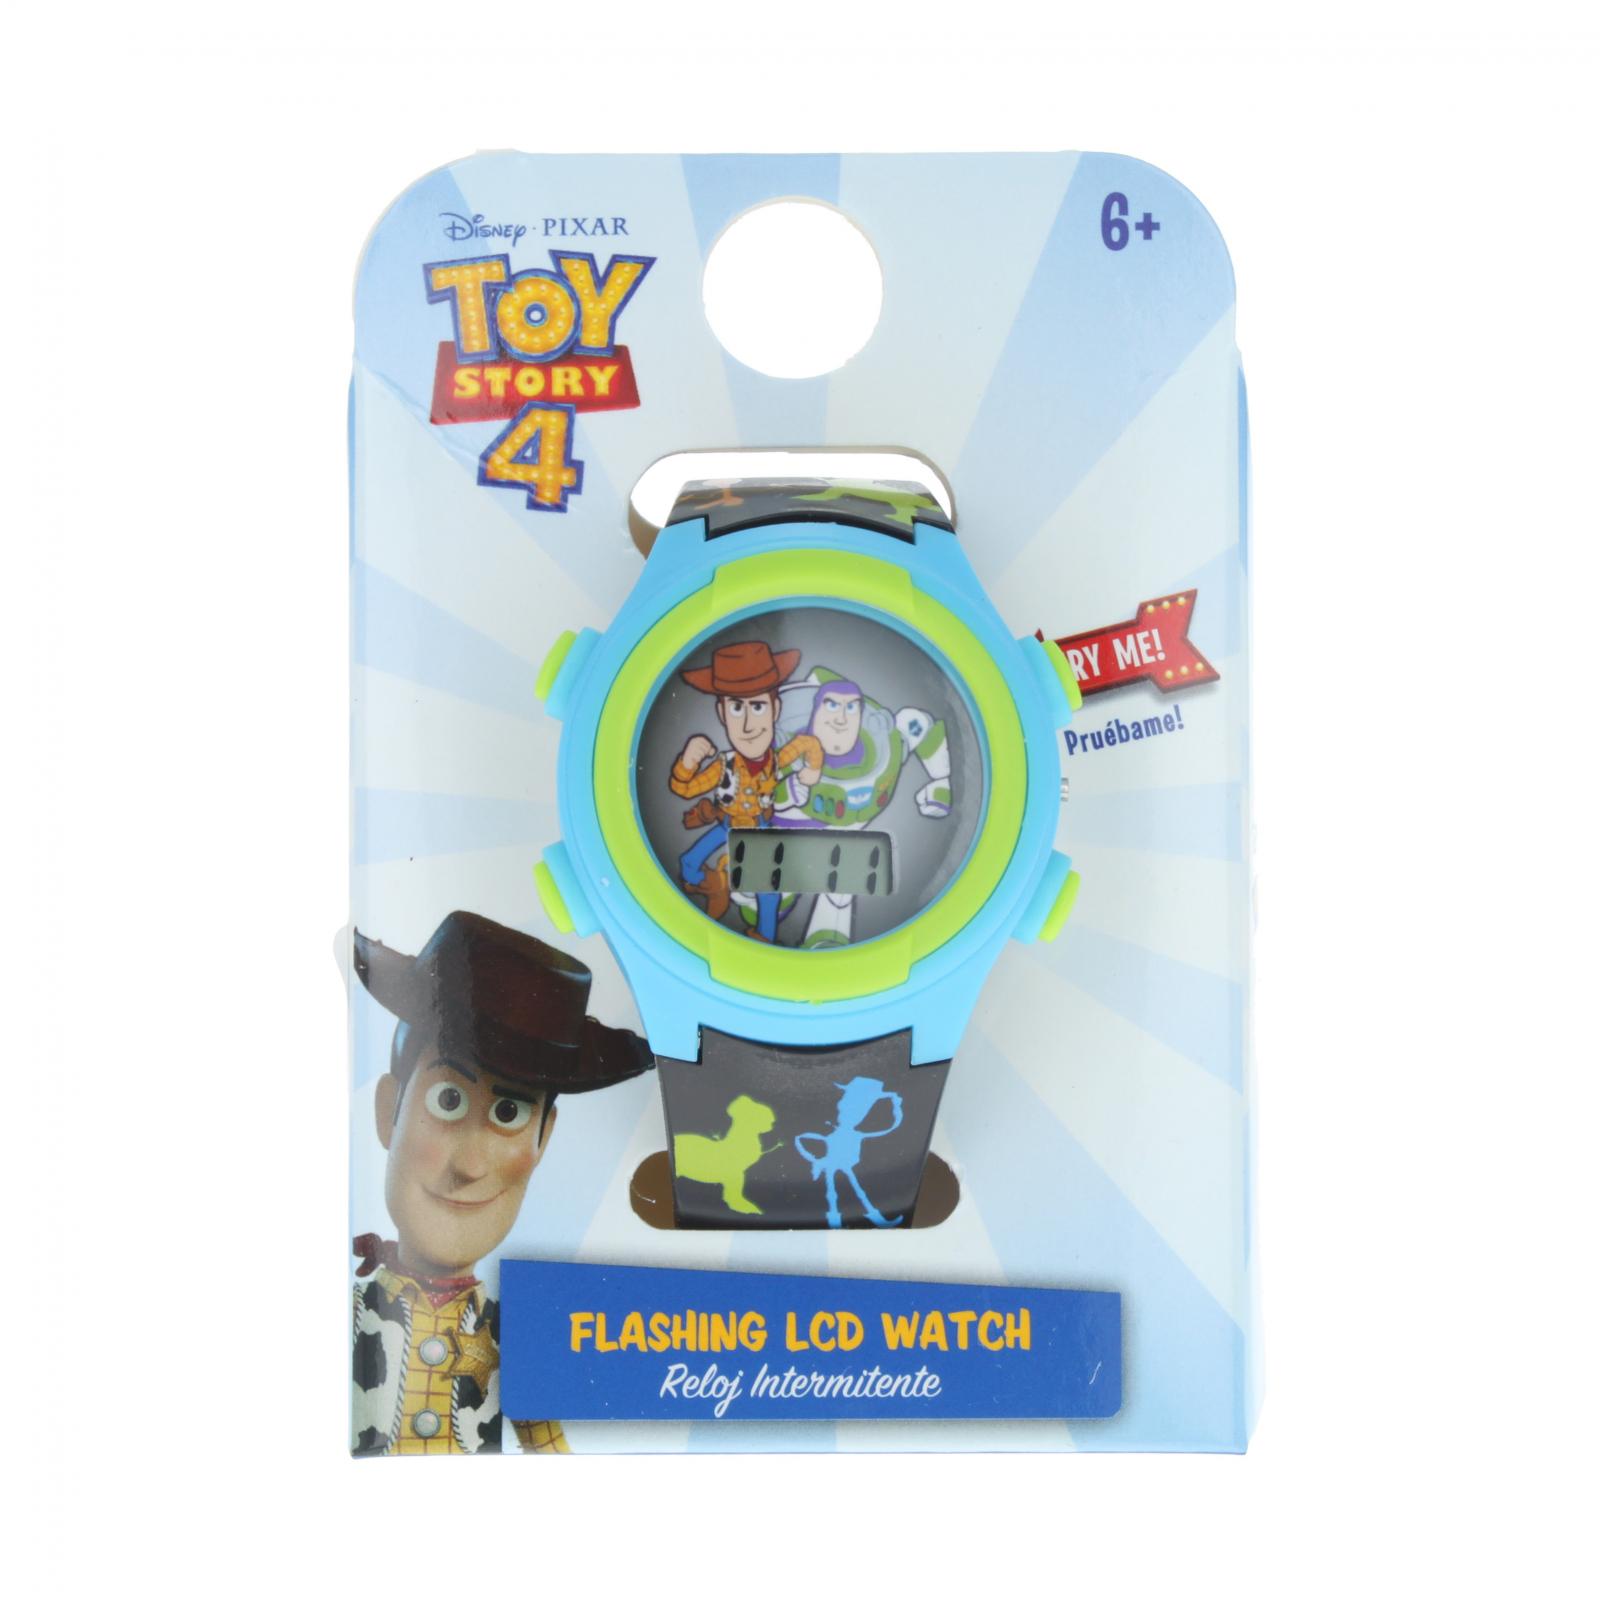 Toy Story 4 Adjustable Light Up Flashing LCD Wrist Watch